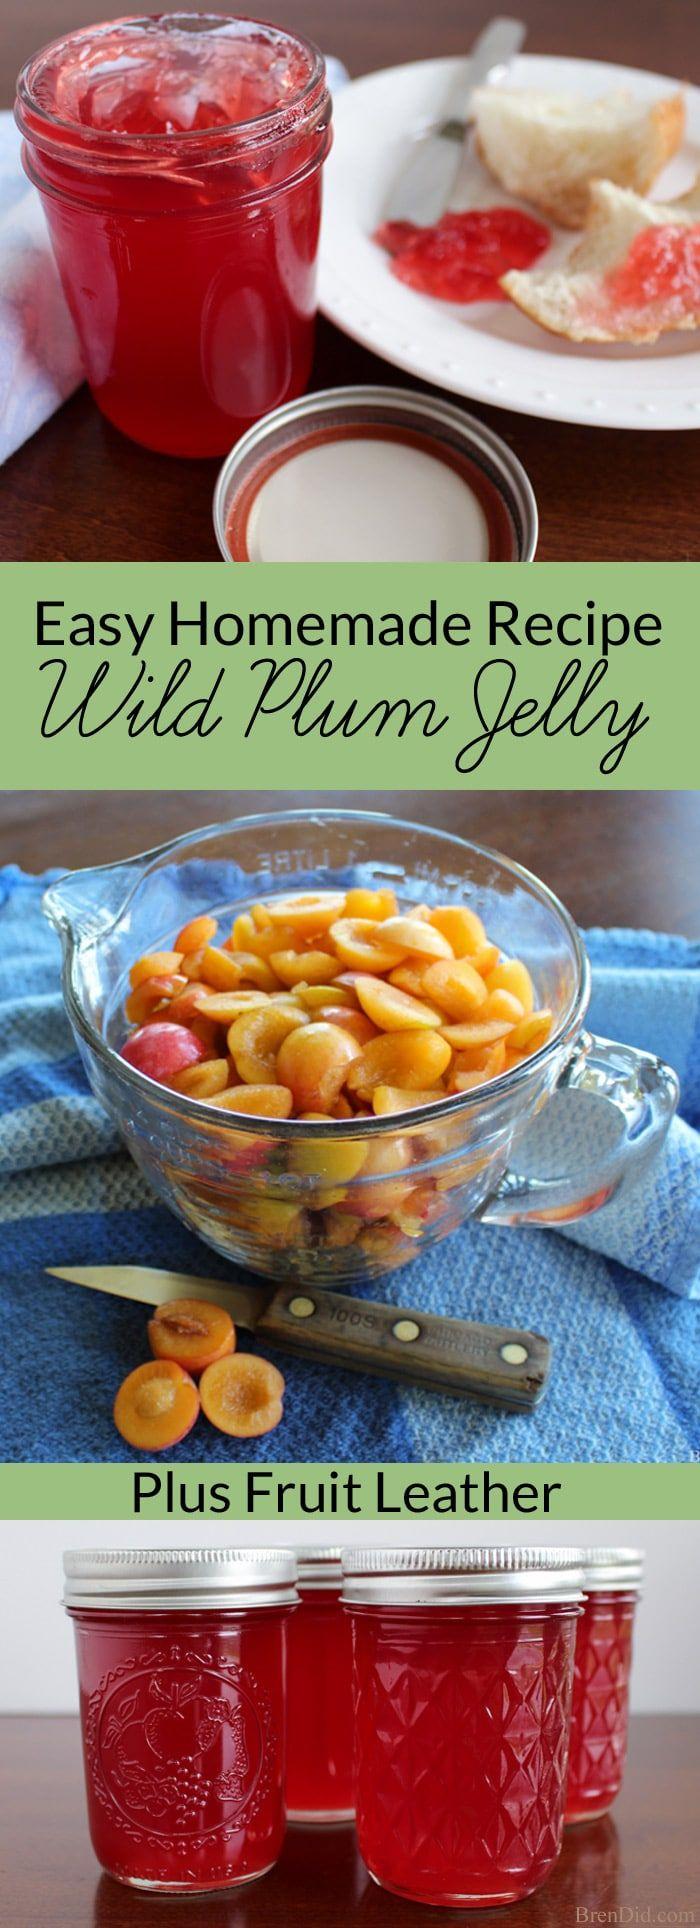 plum jelly recipe | easy homemade jelly | wild plum jelly | how to make jelly via @brendidblog